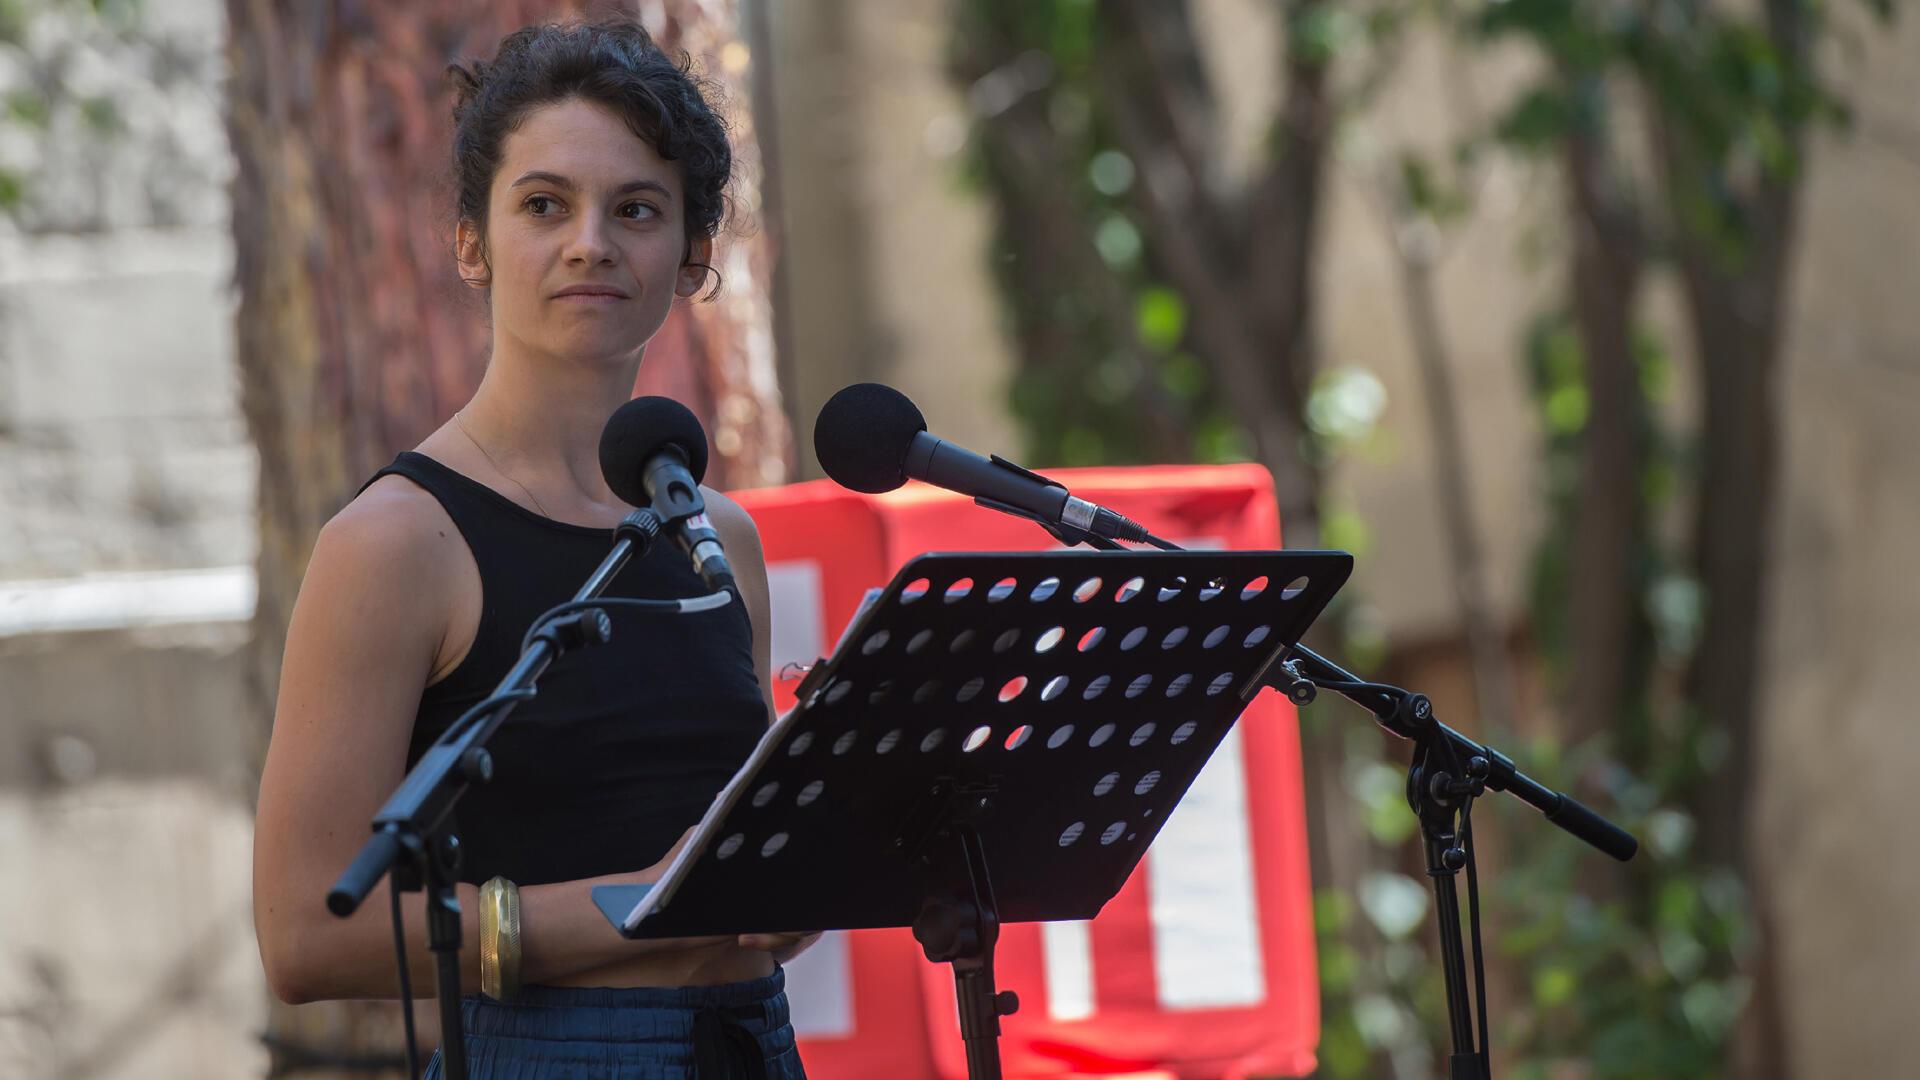 CELLE QUI REGARDE LE MONDE, d'Alexandra Badea. Ça va, ça va le monde! Festival d'Avignon 2019.